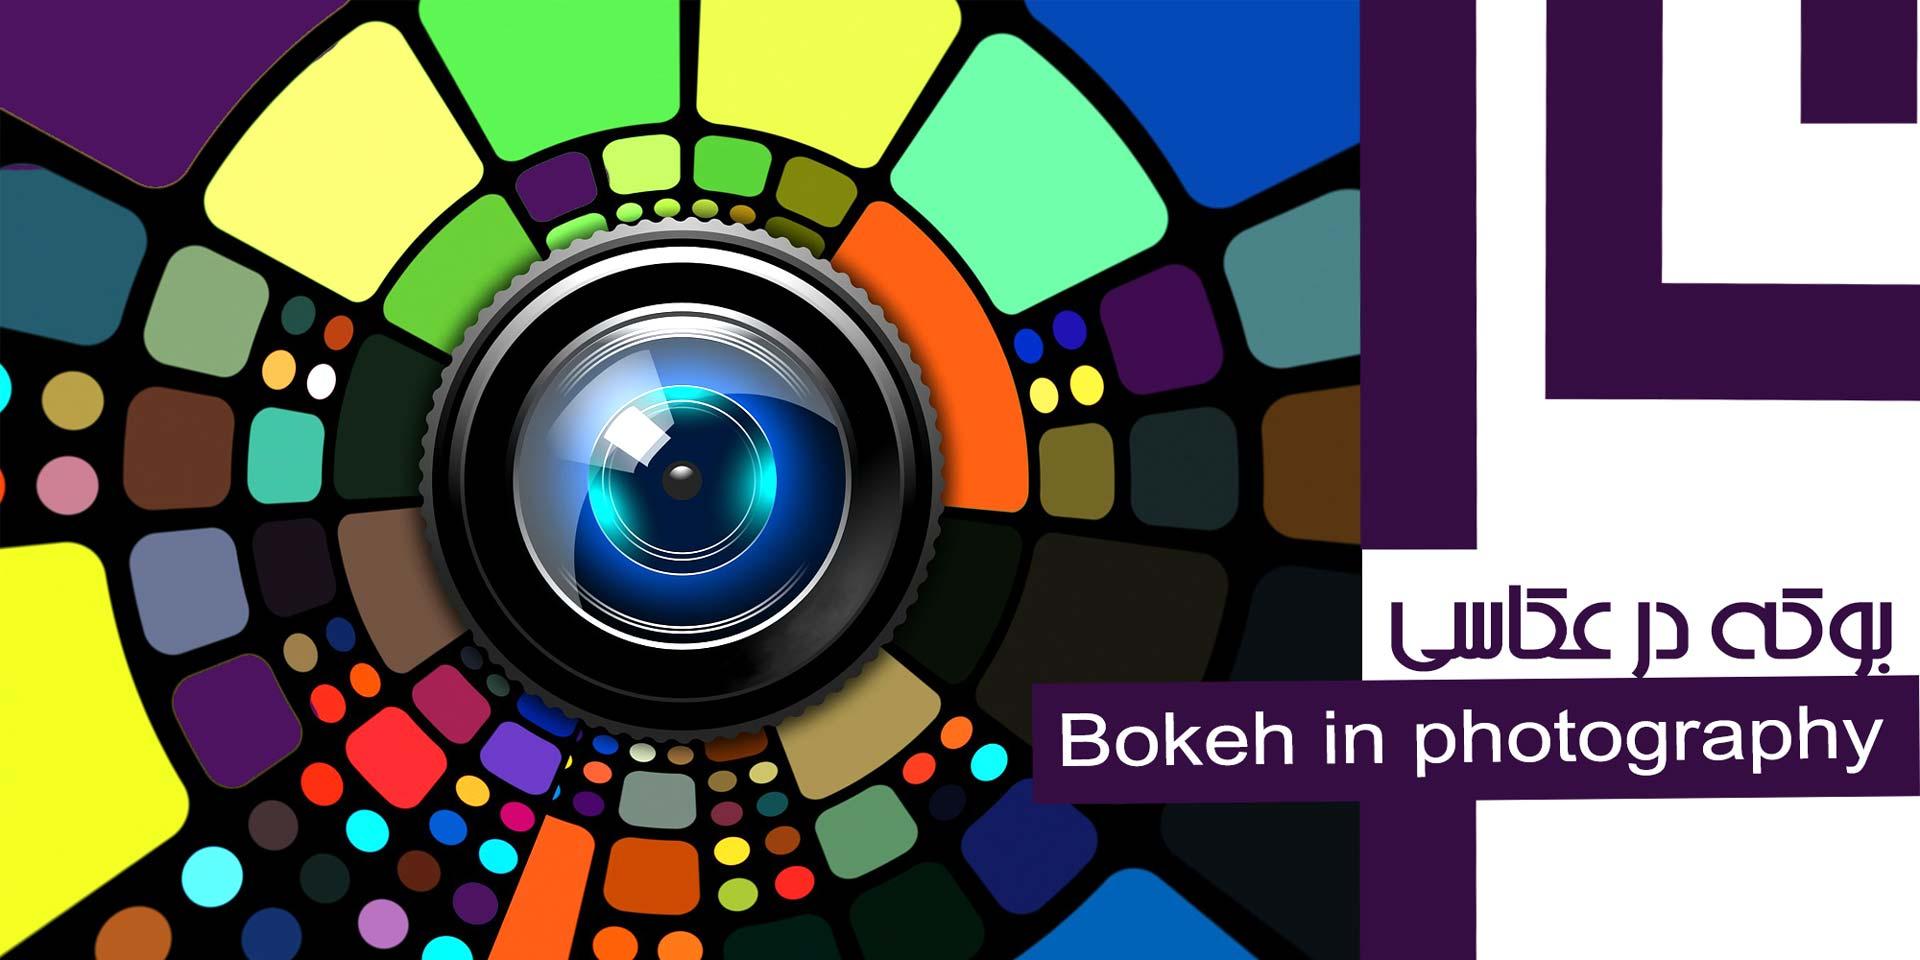 boke a1 1 - بوکه در عکاسی